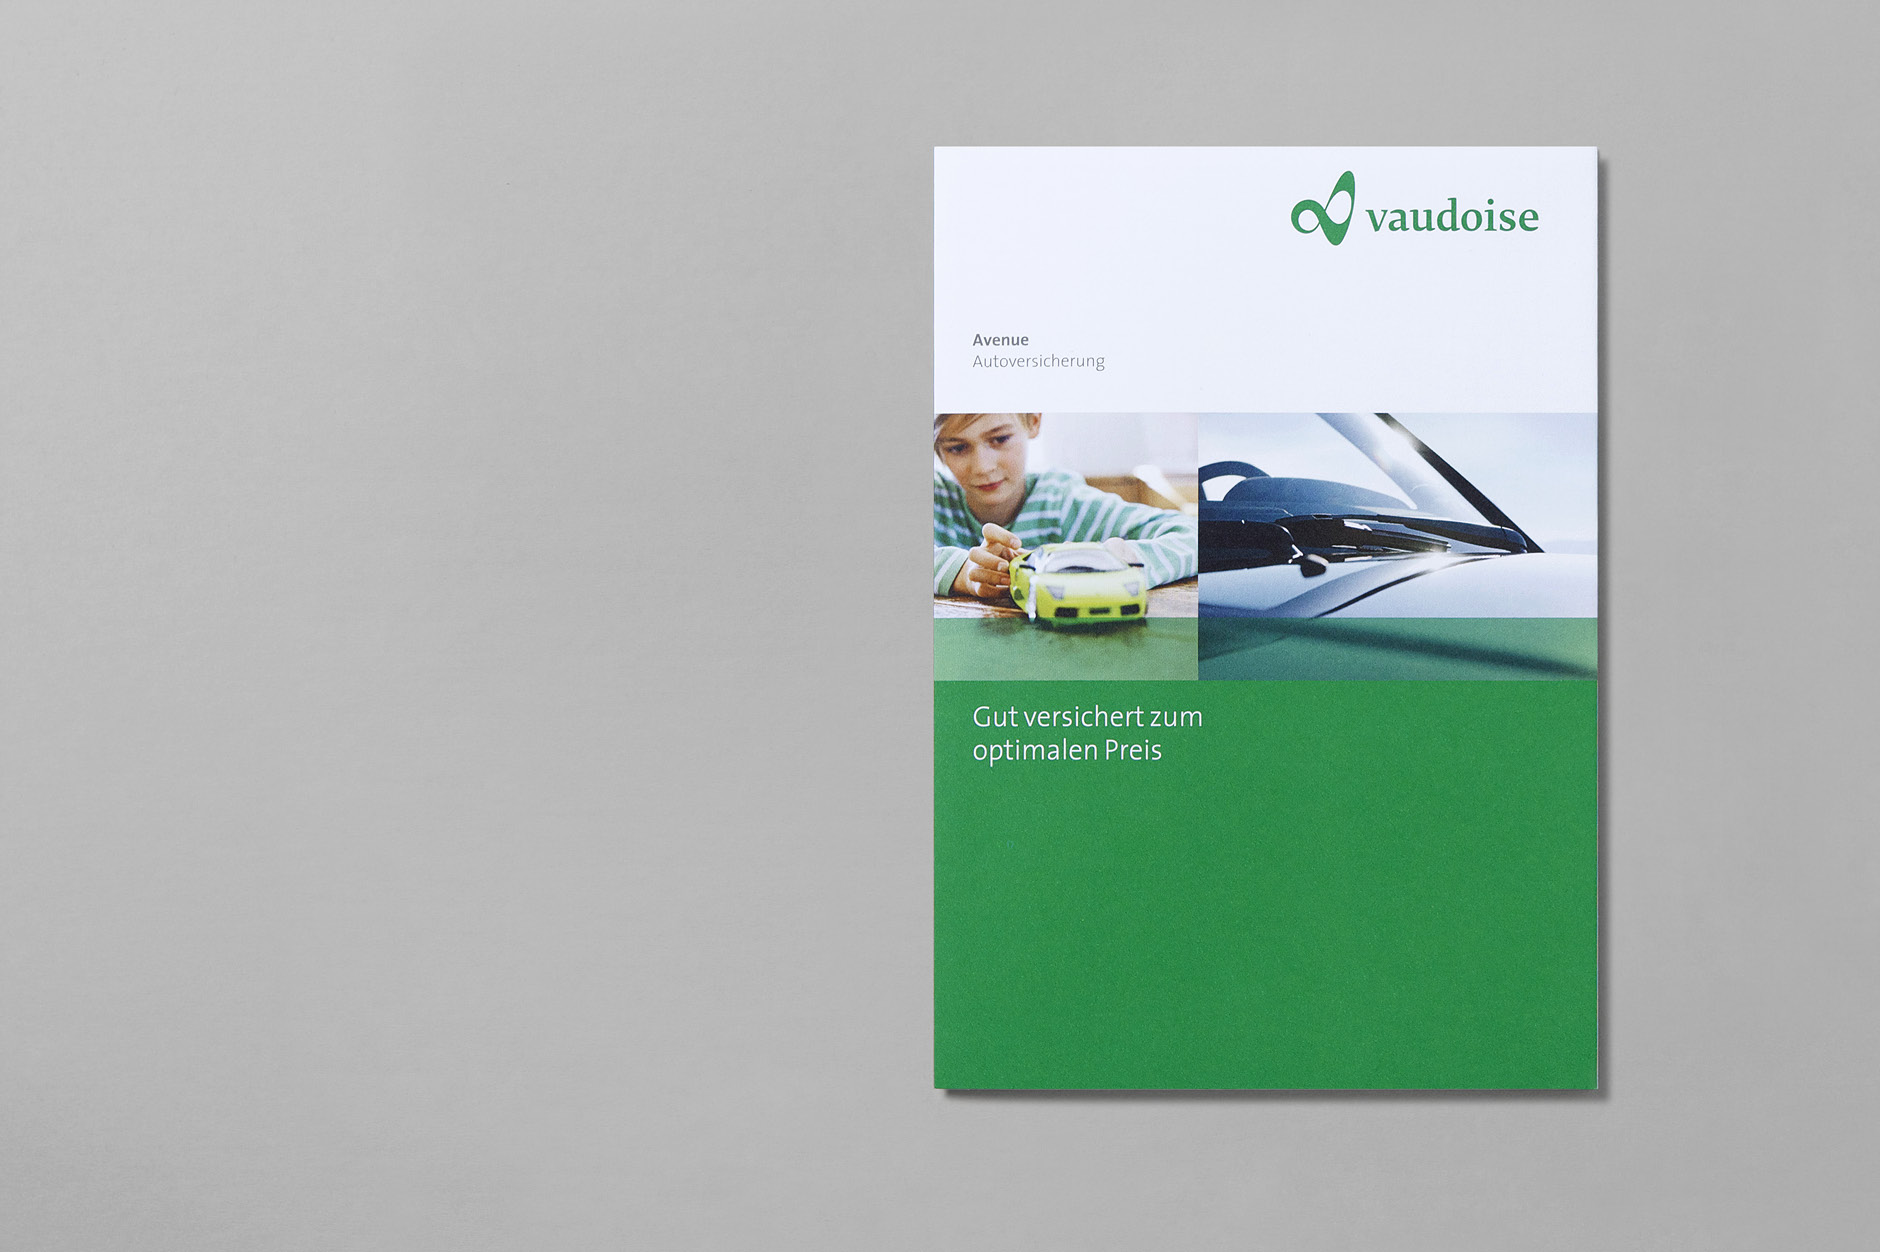 Autoversicherung Vaudoise